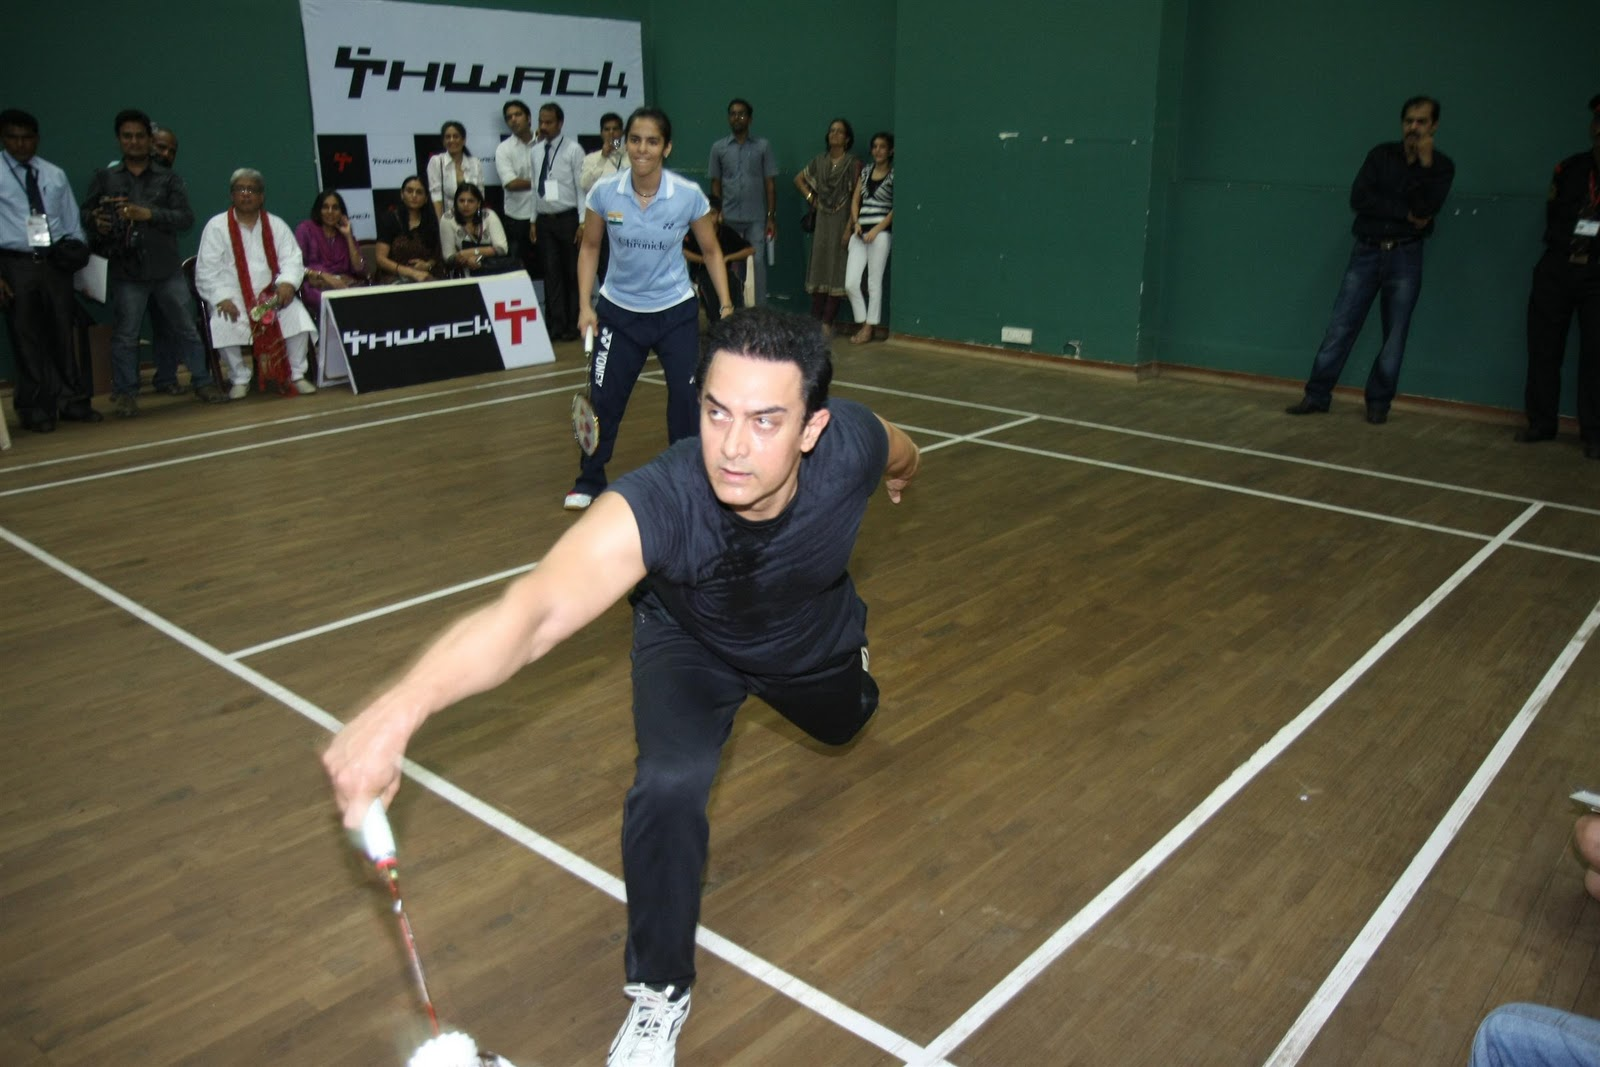 http://2.bp.blogspot.com/-273iQYddthk/TutwSS9nFeI/AAAAAAAAE_o/9RDwP5bpX98/s1600/Aamir-Khan-Saina-Nehwal-at-exhibition-match-14.JPG